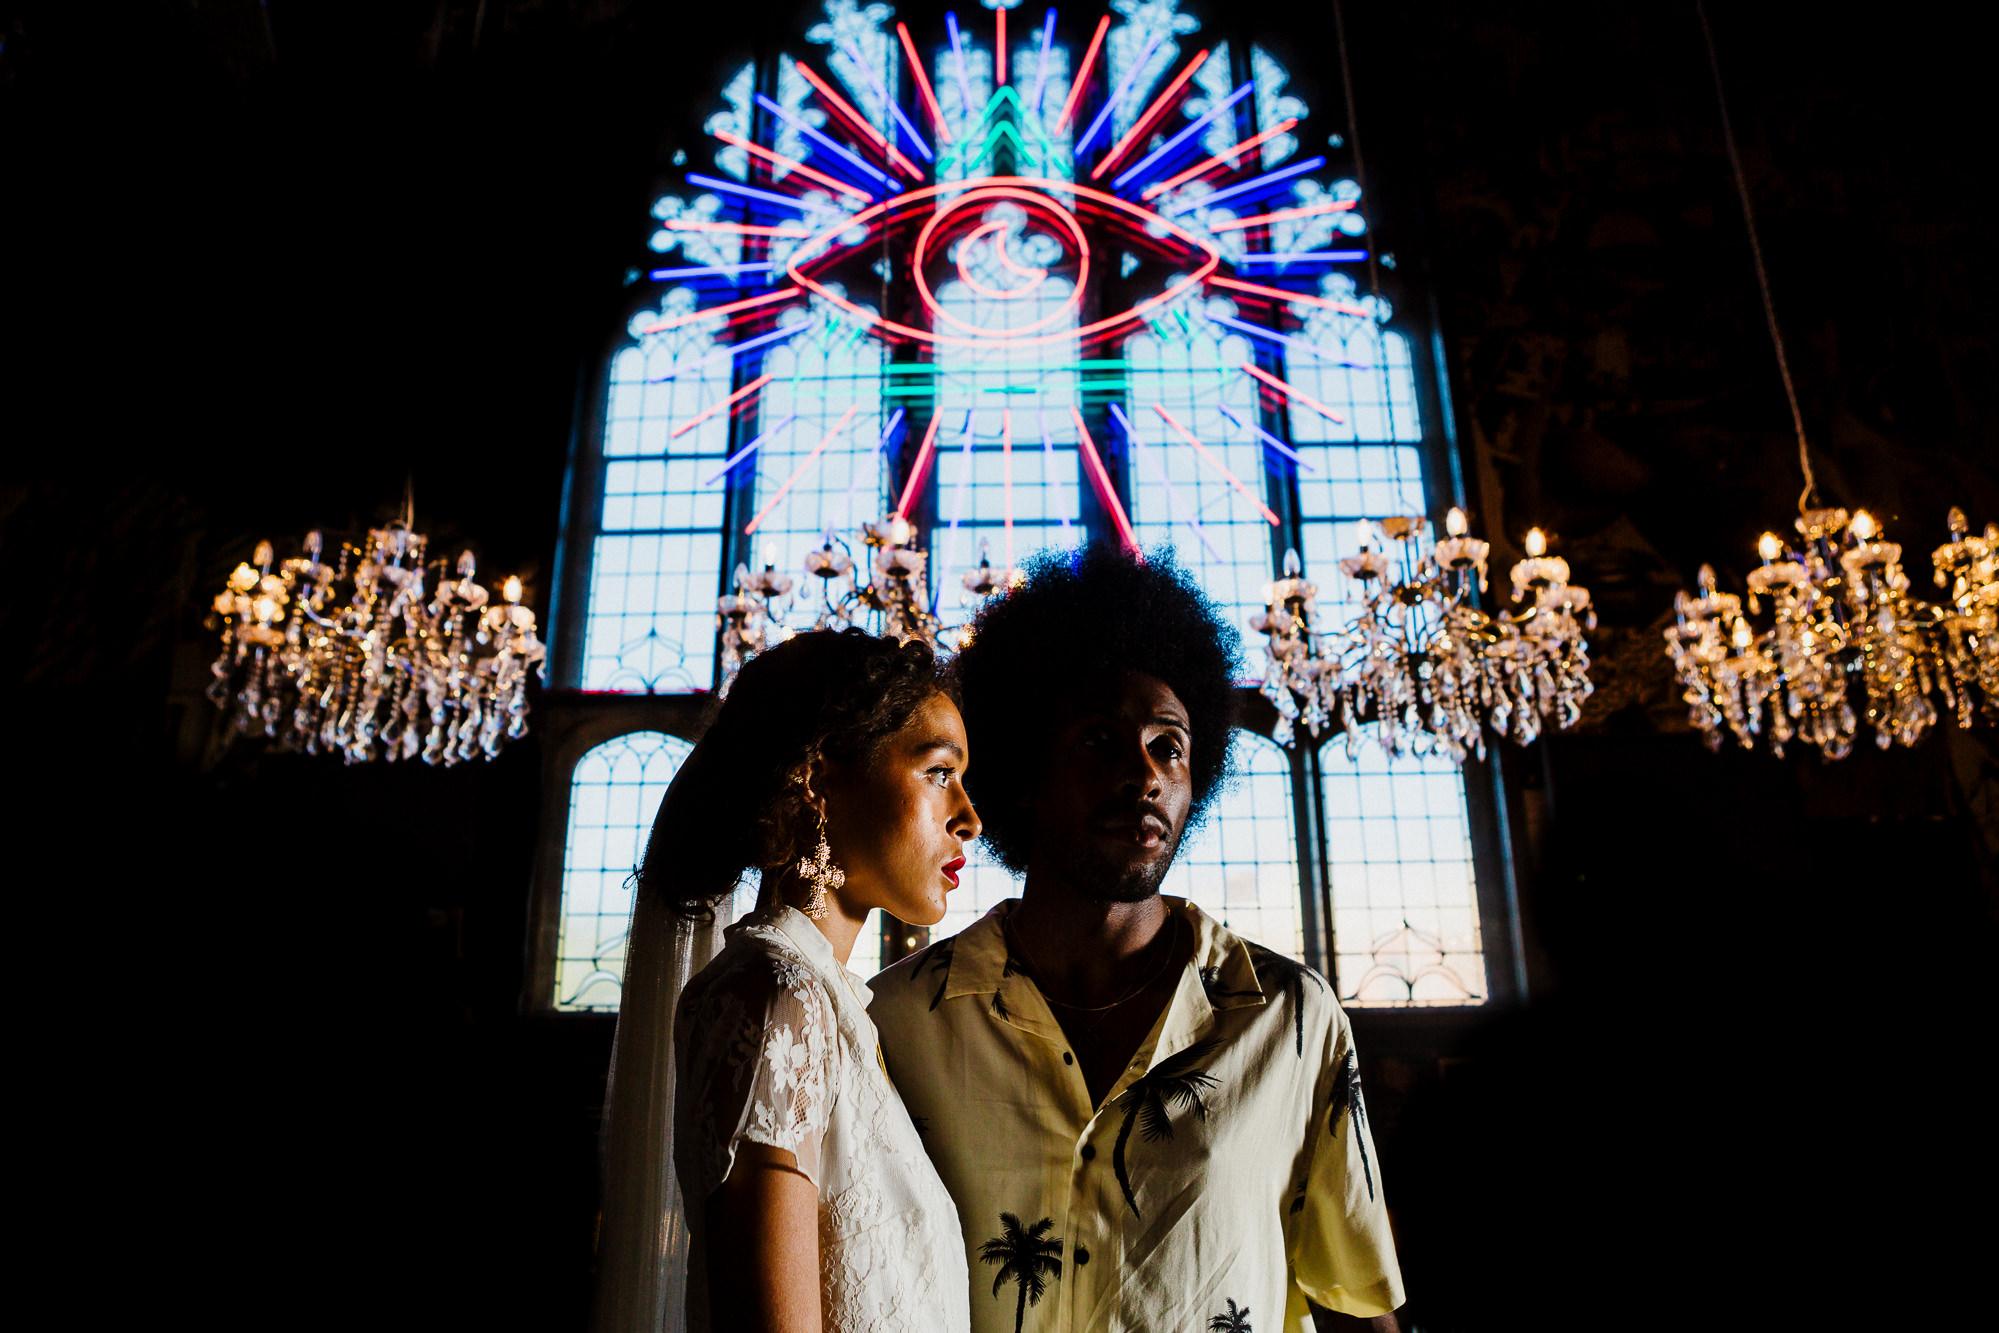 R&J_WEDDING ENTHUSIAST_TIM_DUNK-103.jpg